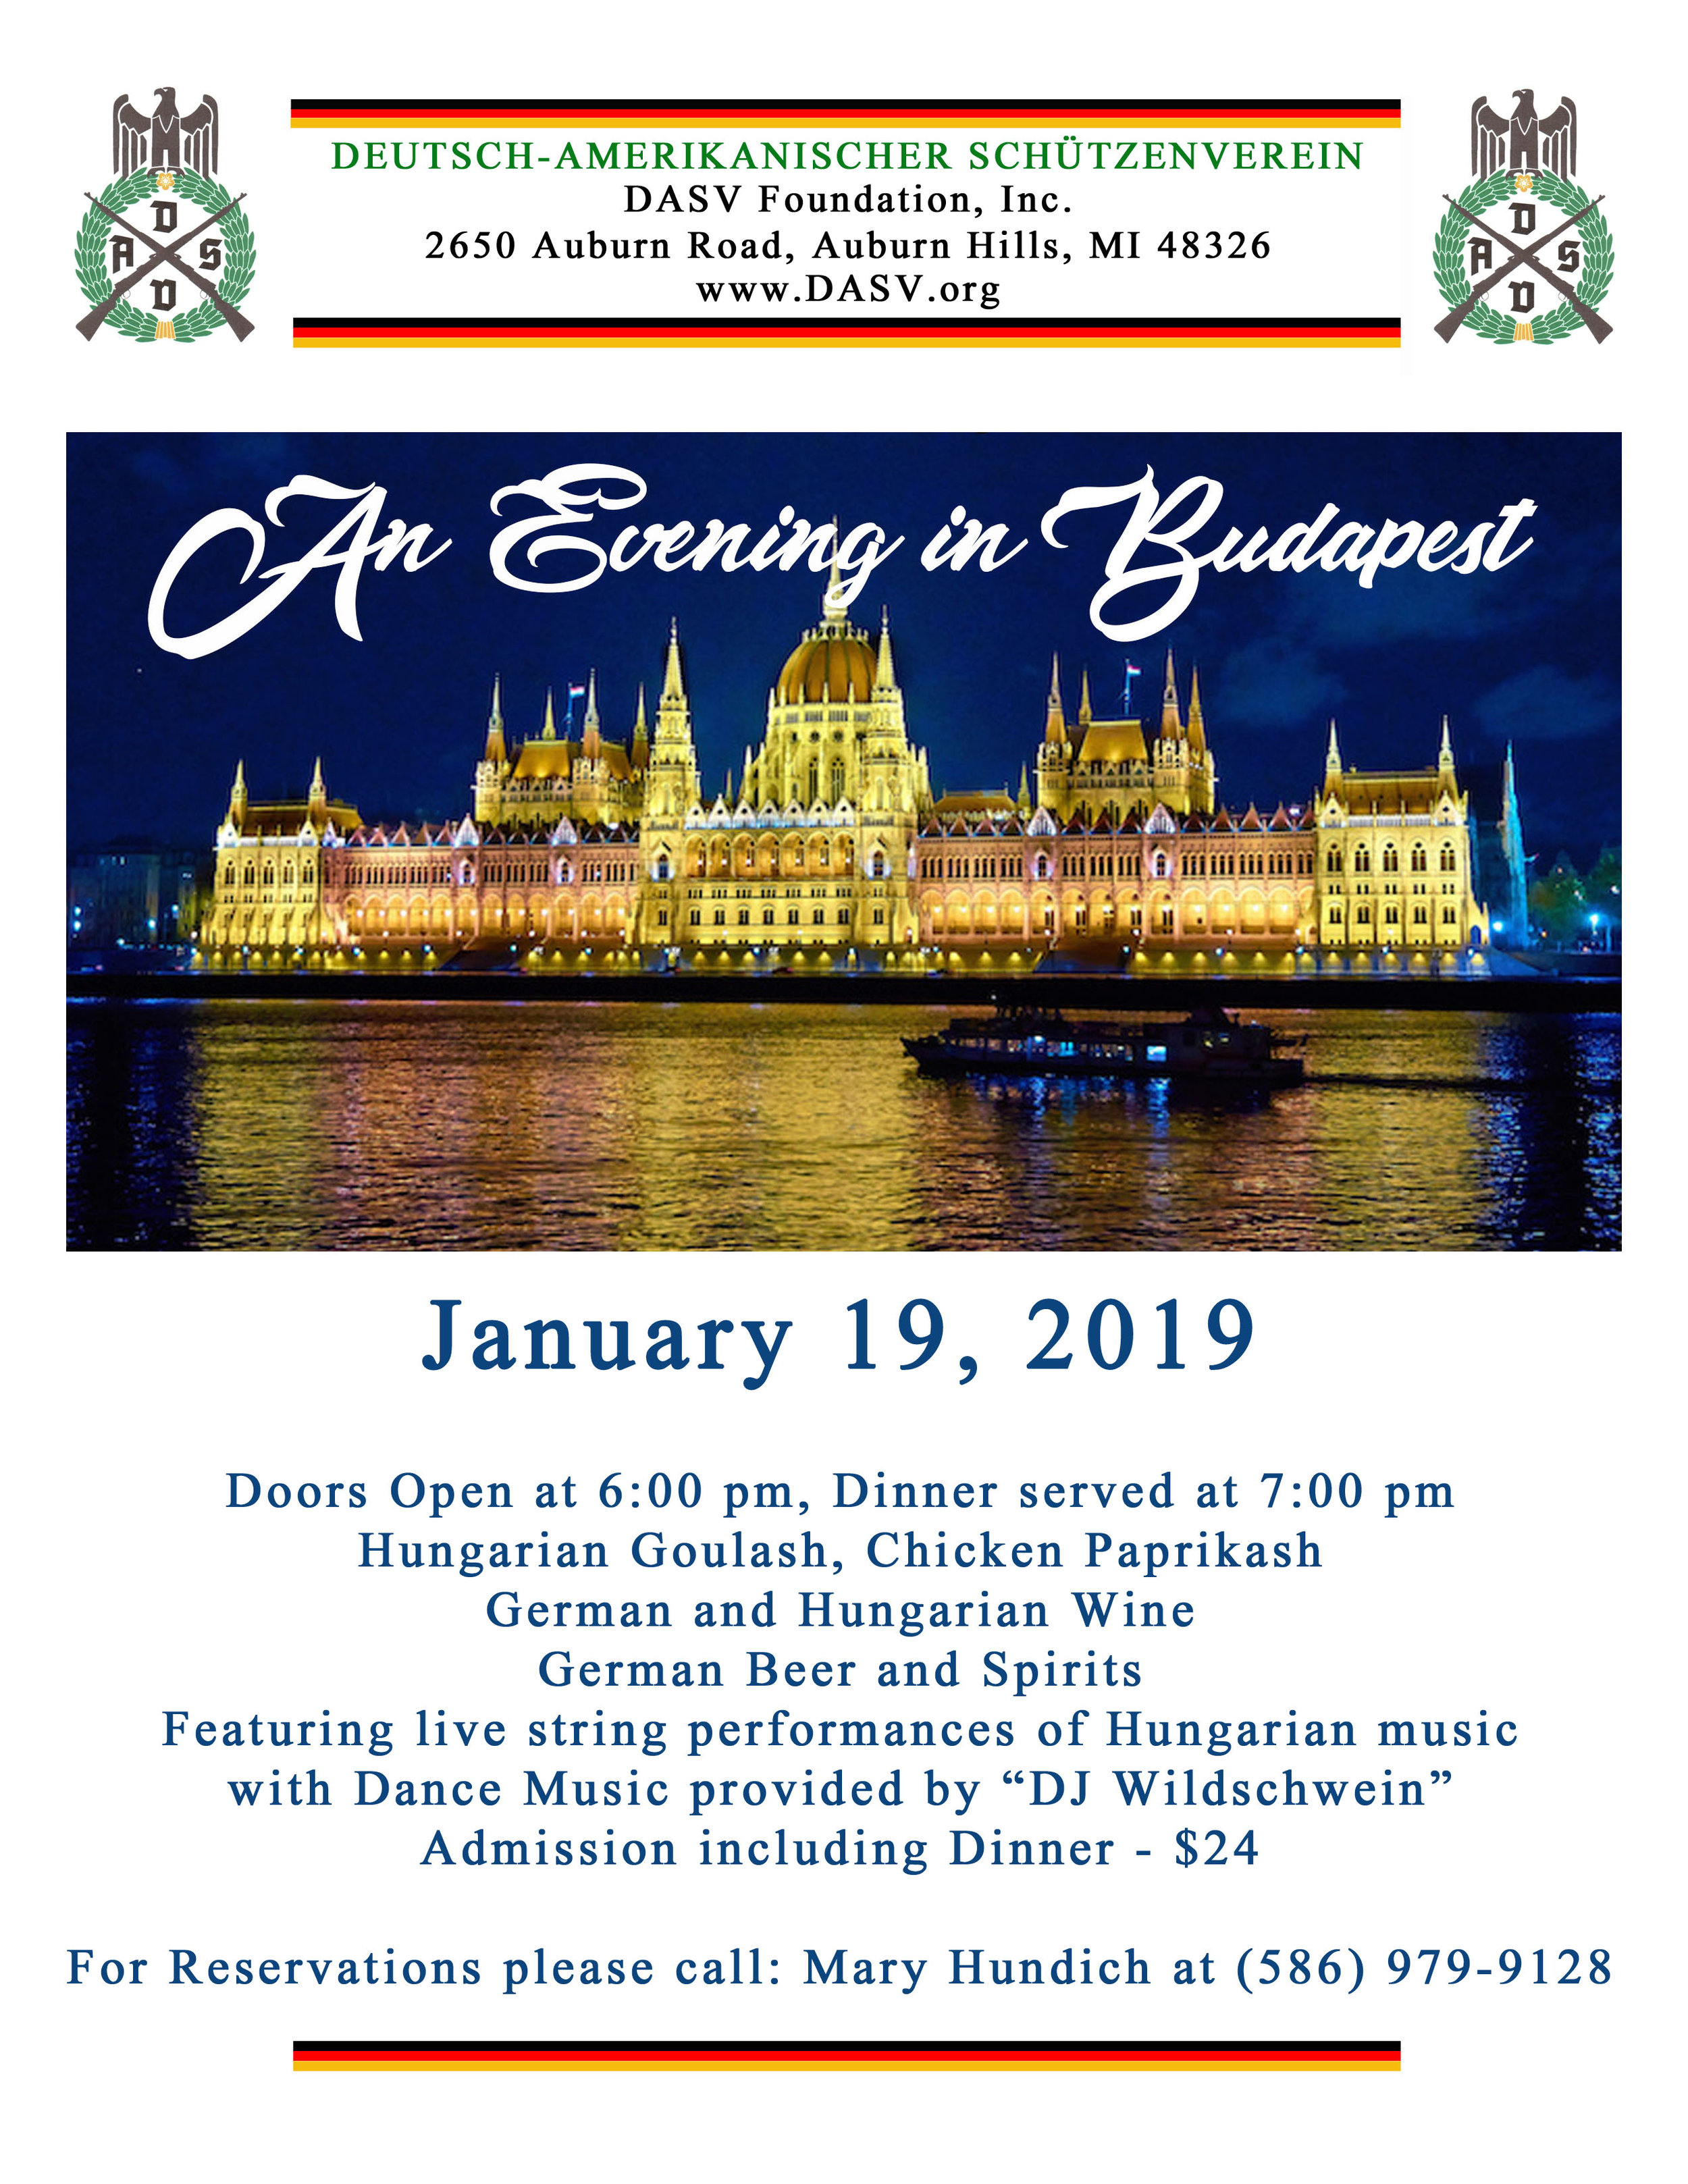 Evening in Budapest.jpg